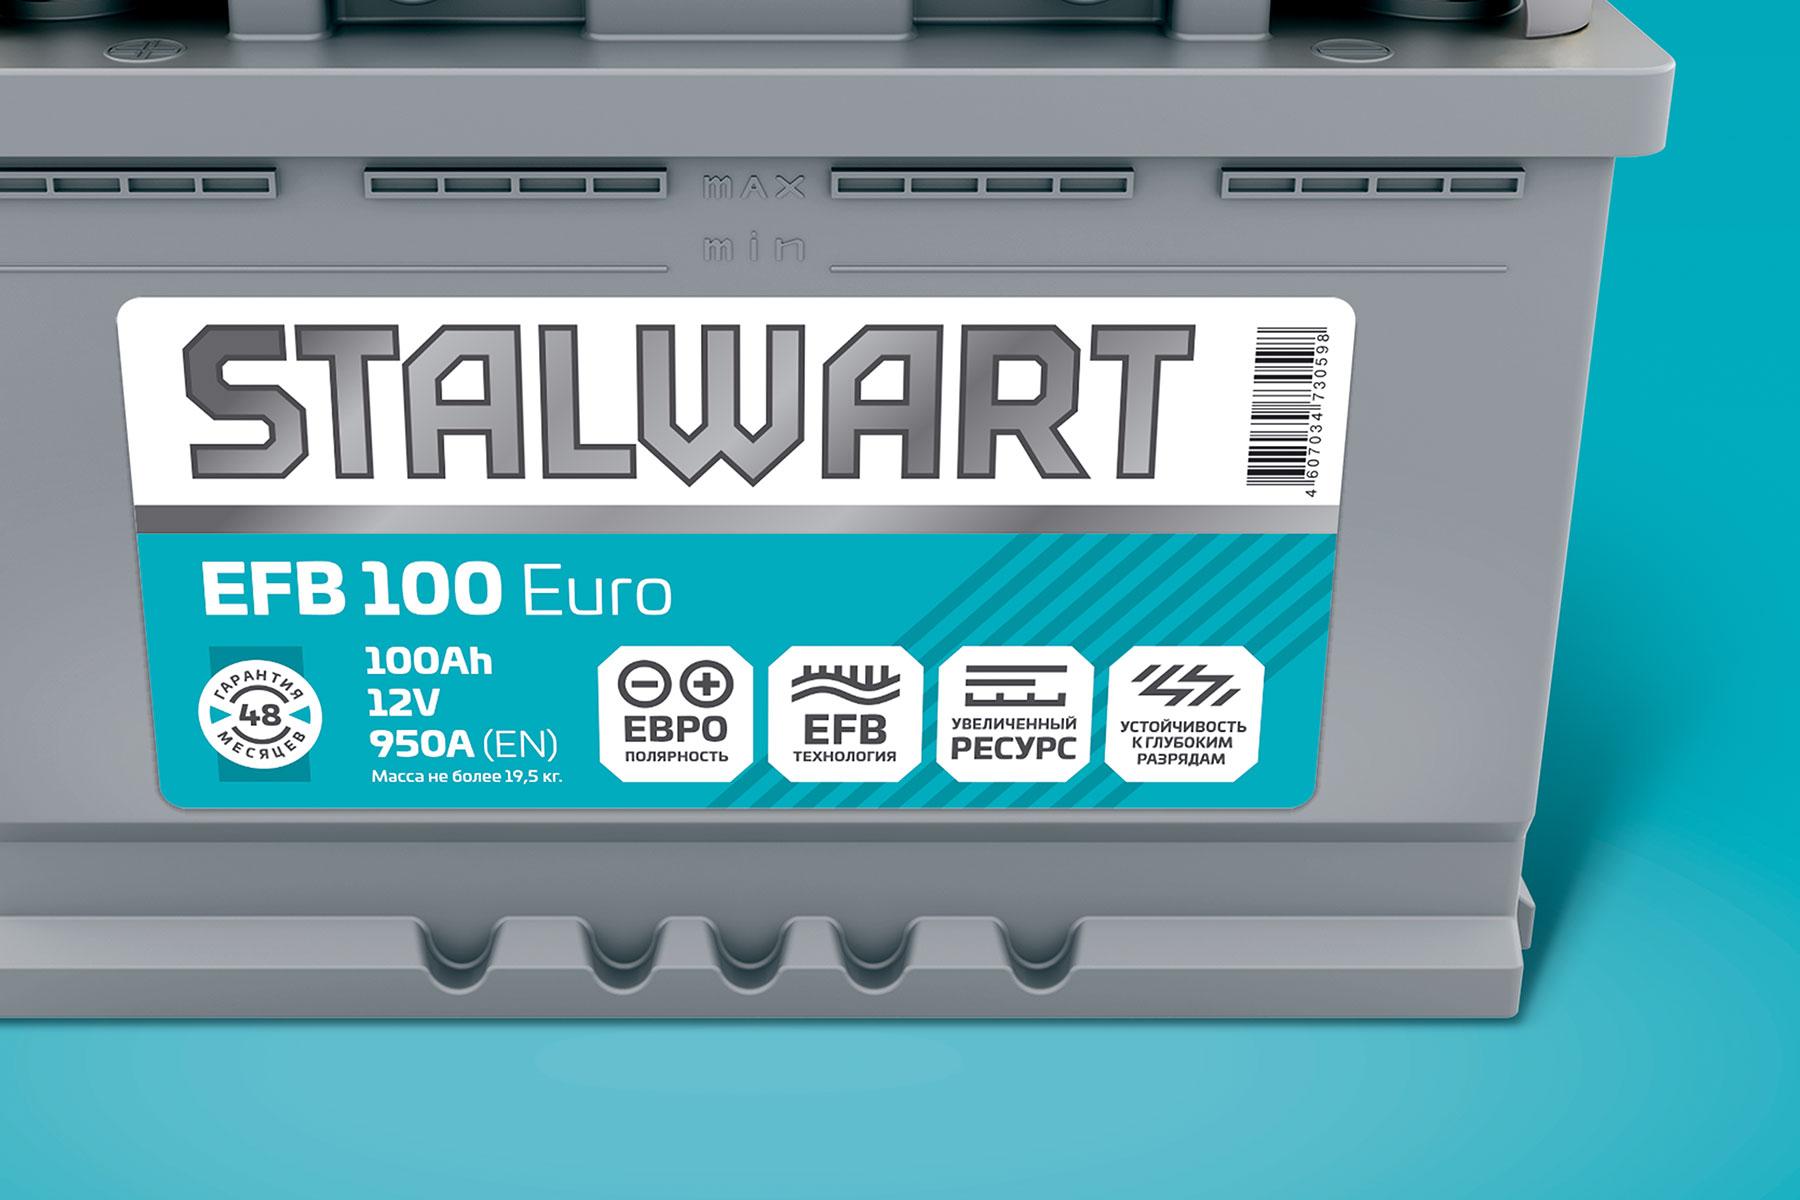 Stalwart-1-EFB-Front-2.jpg